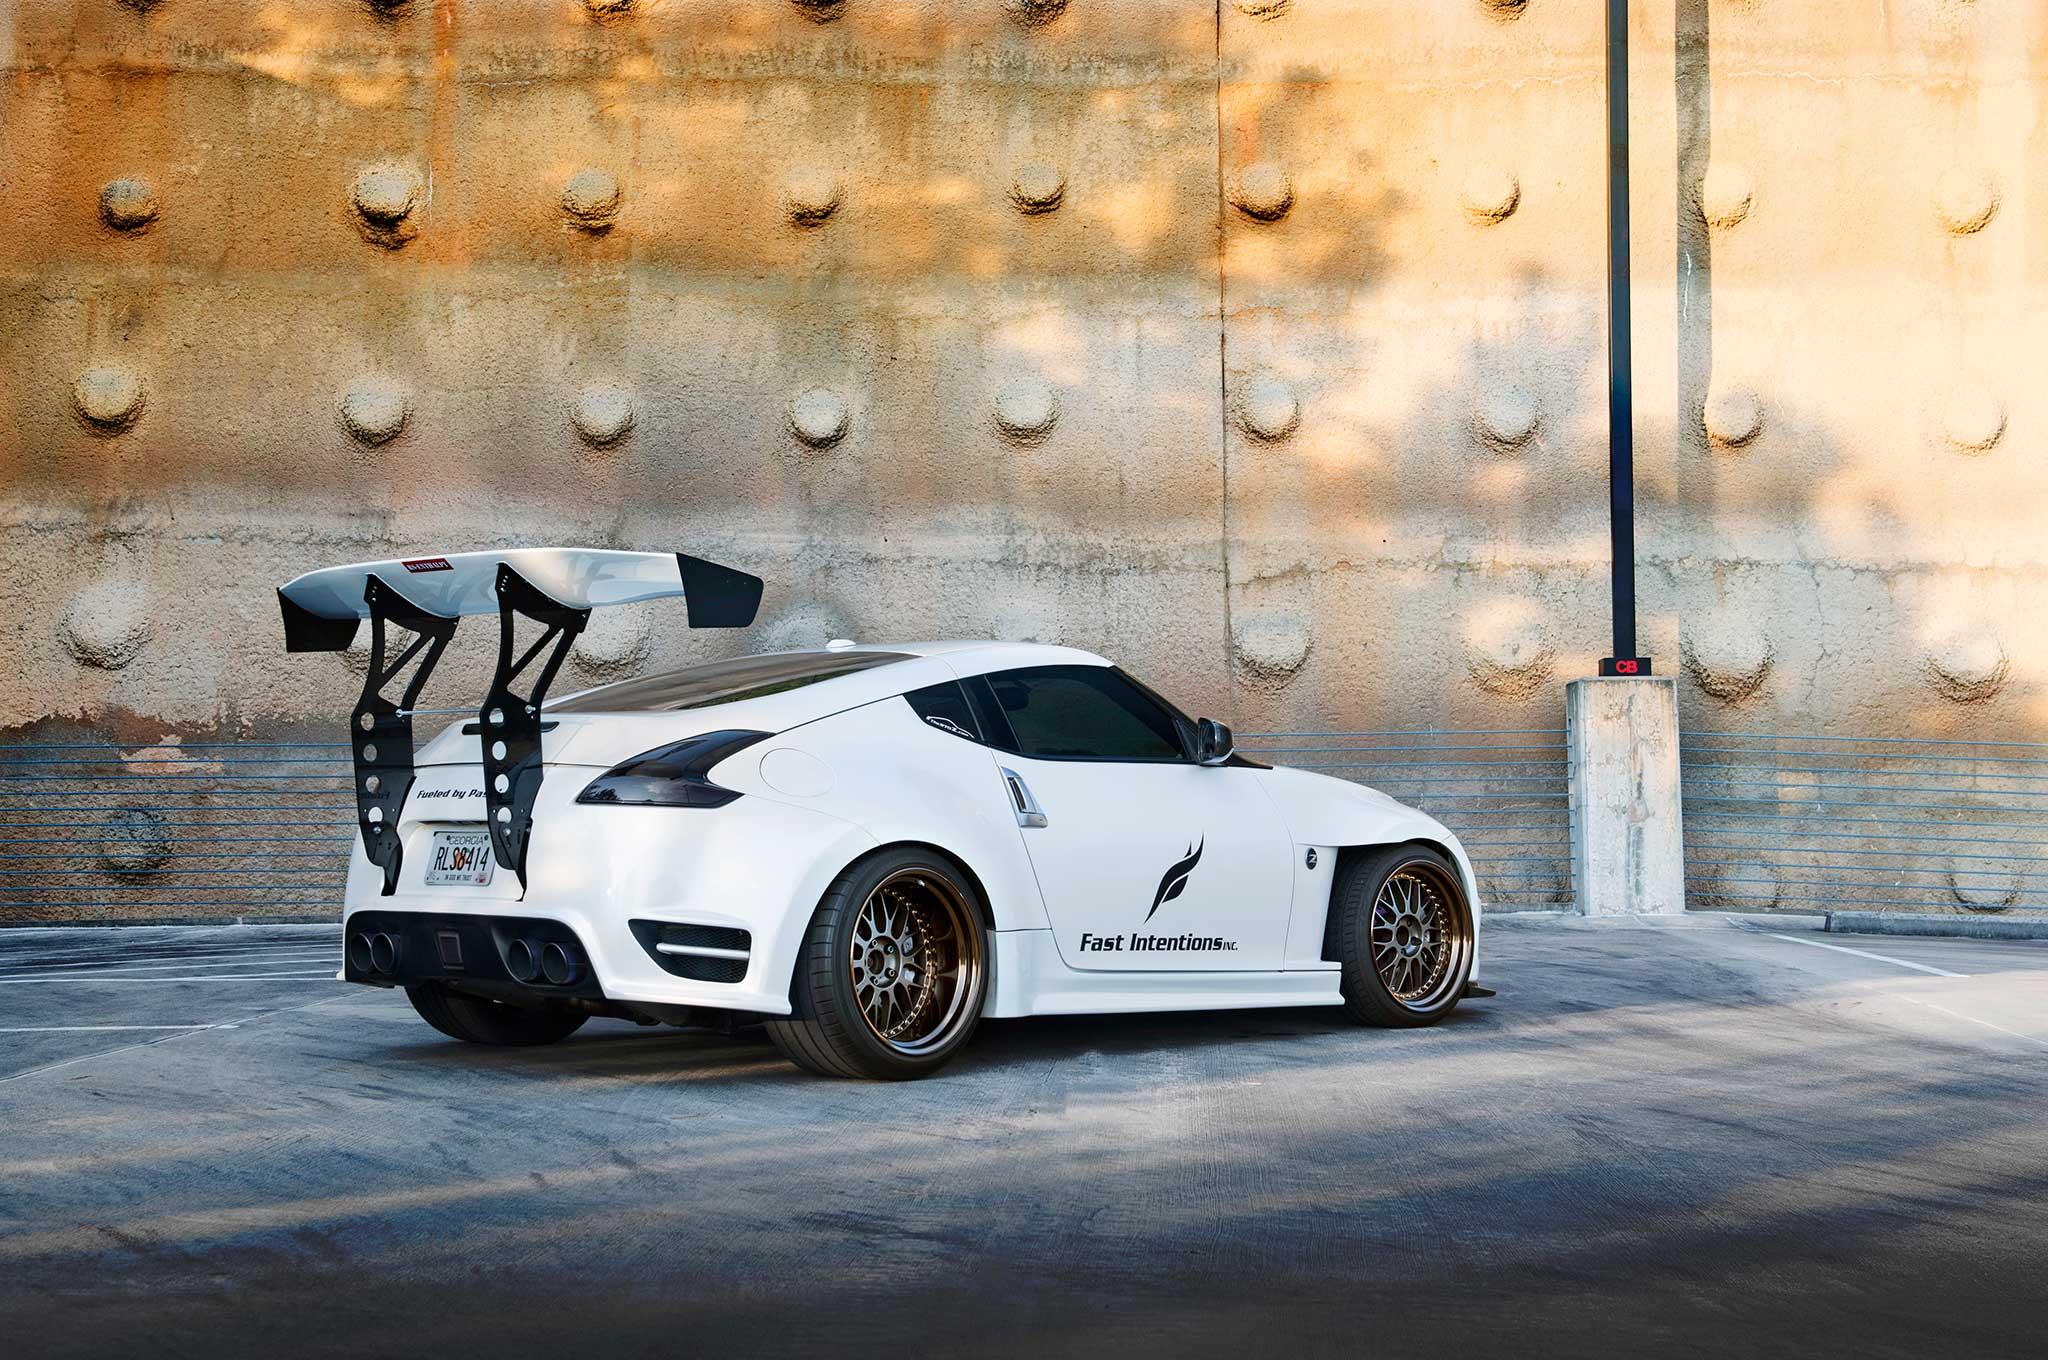 2009 Nissan 370z Taming The White Dragon